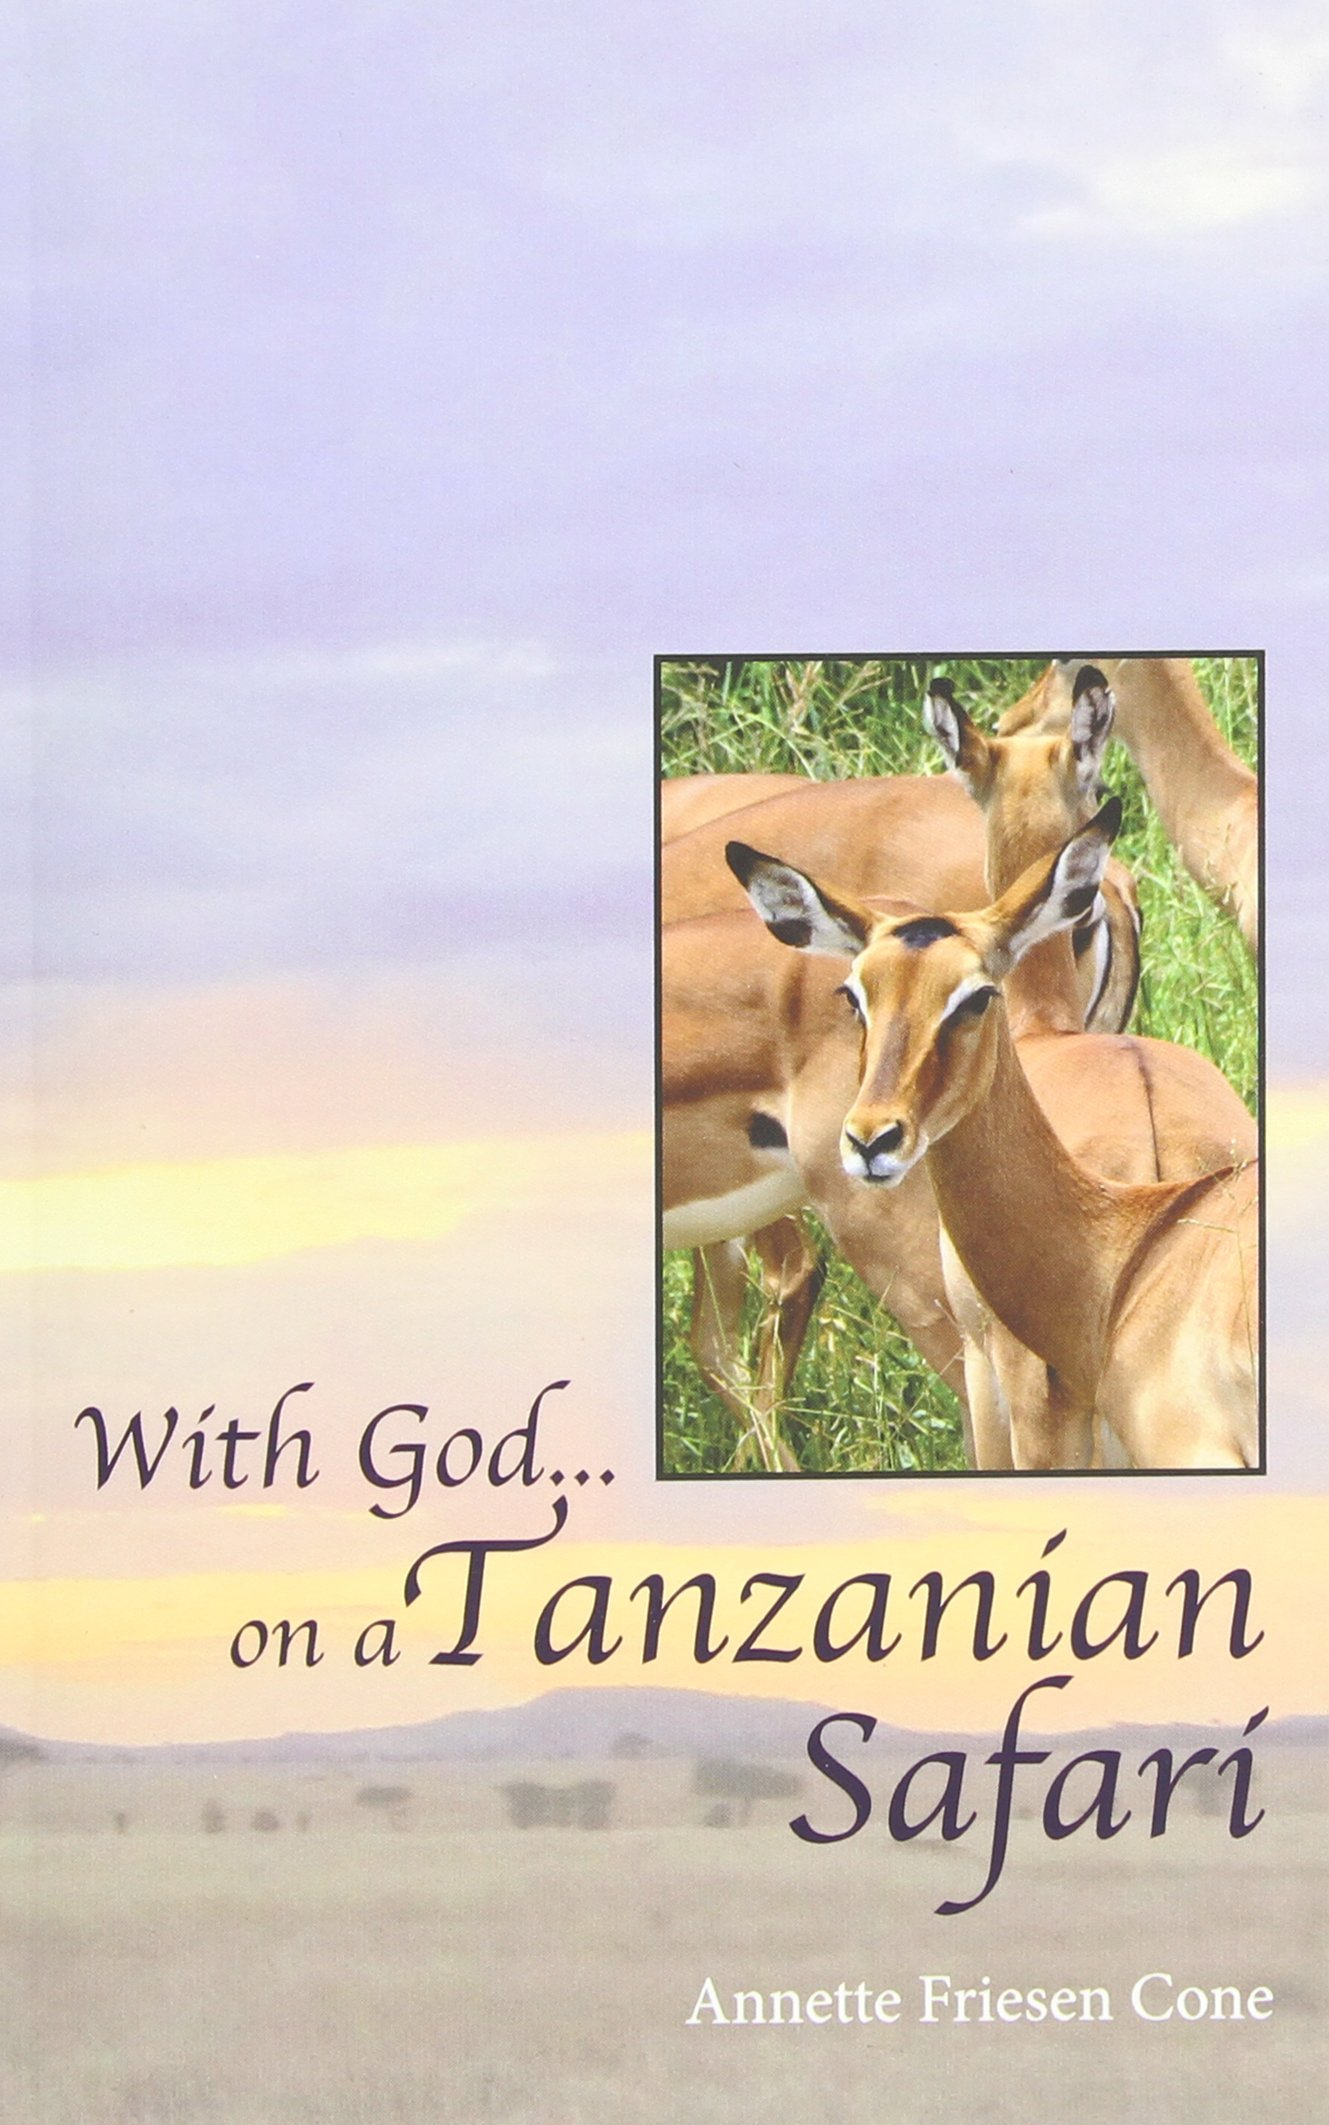 With God... on a Tanzanian Safari